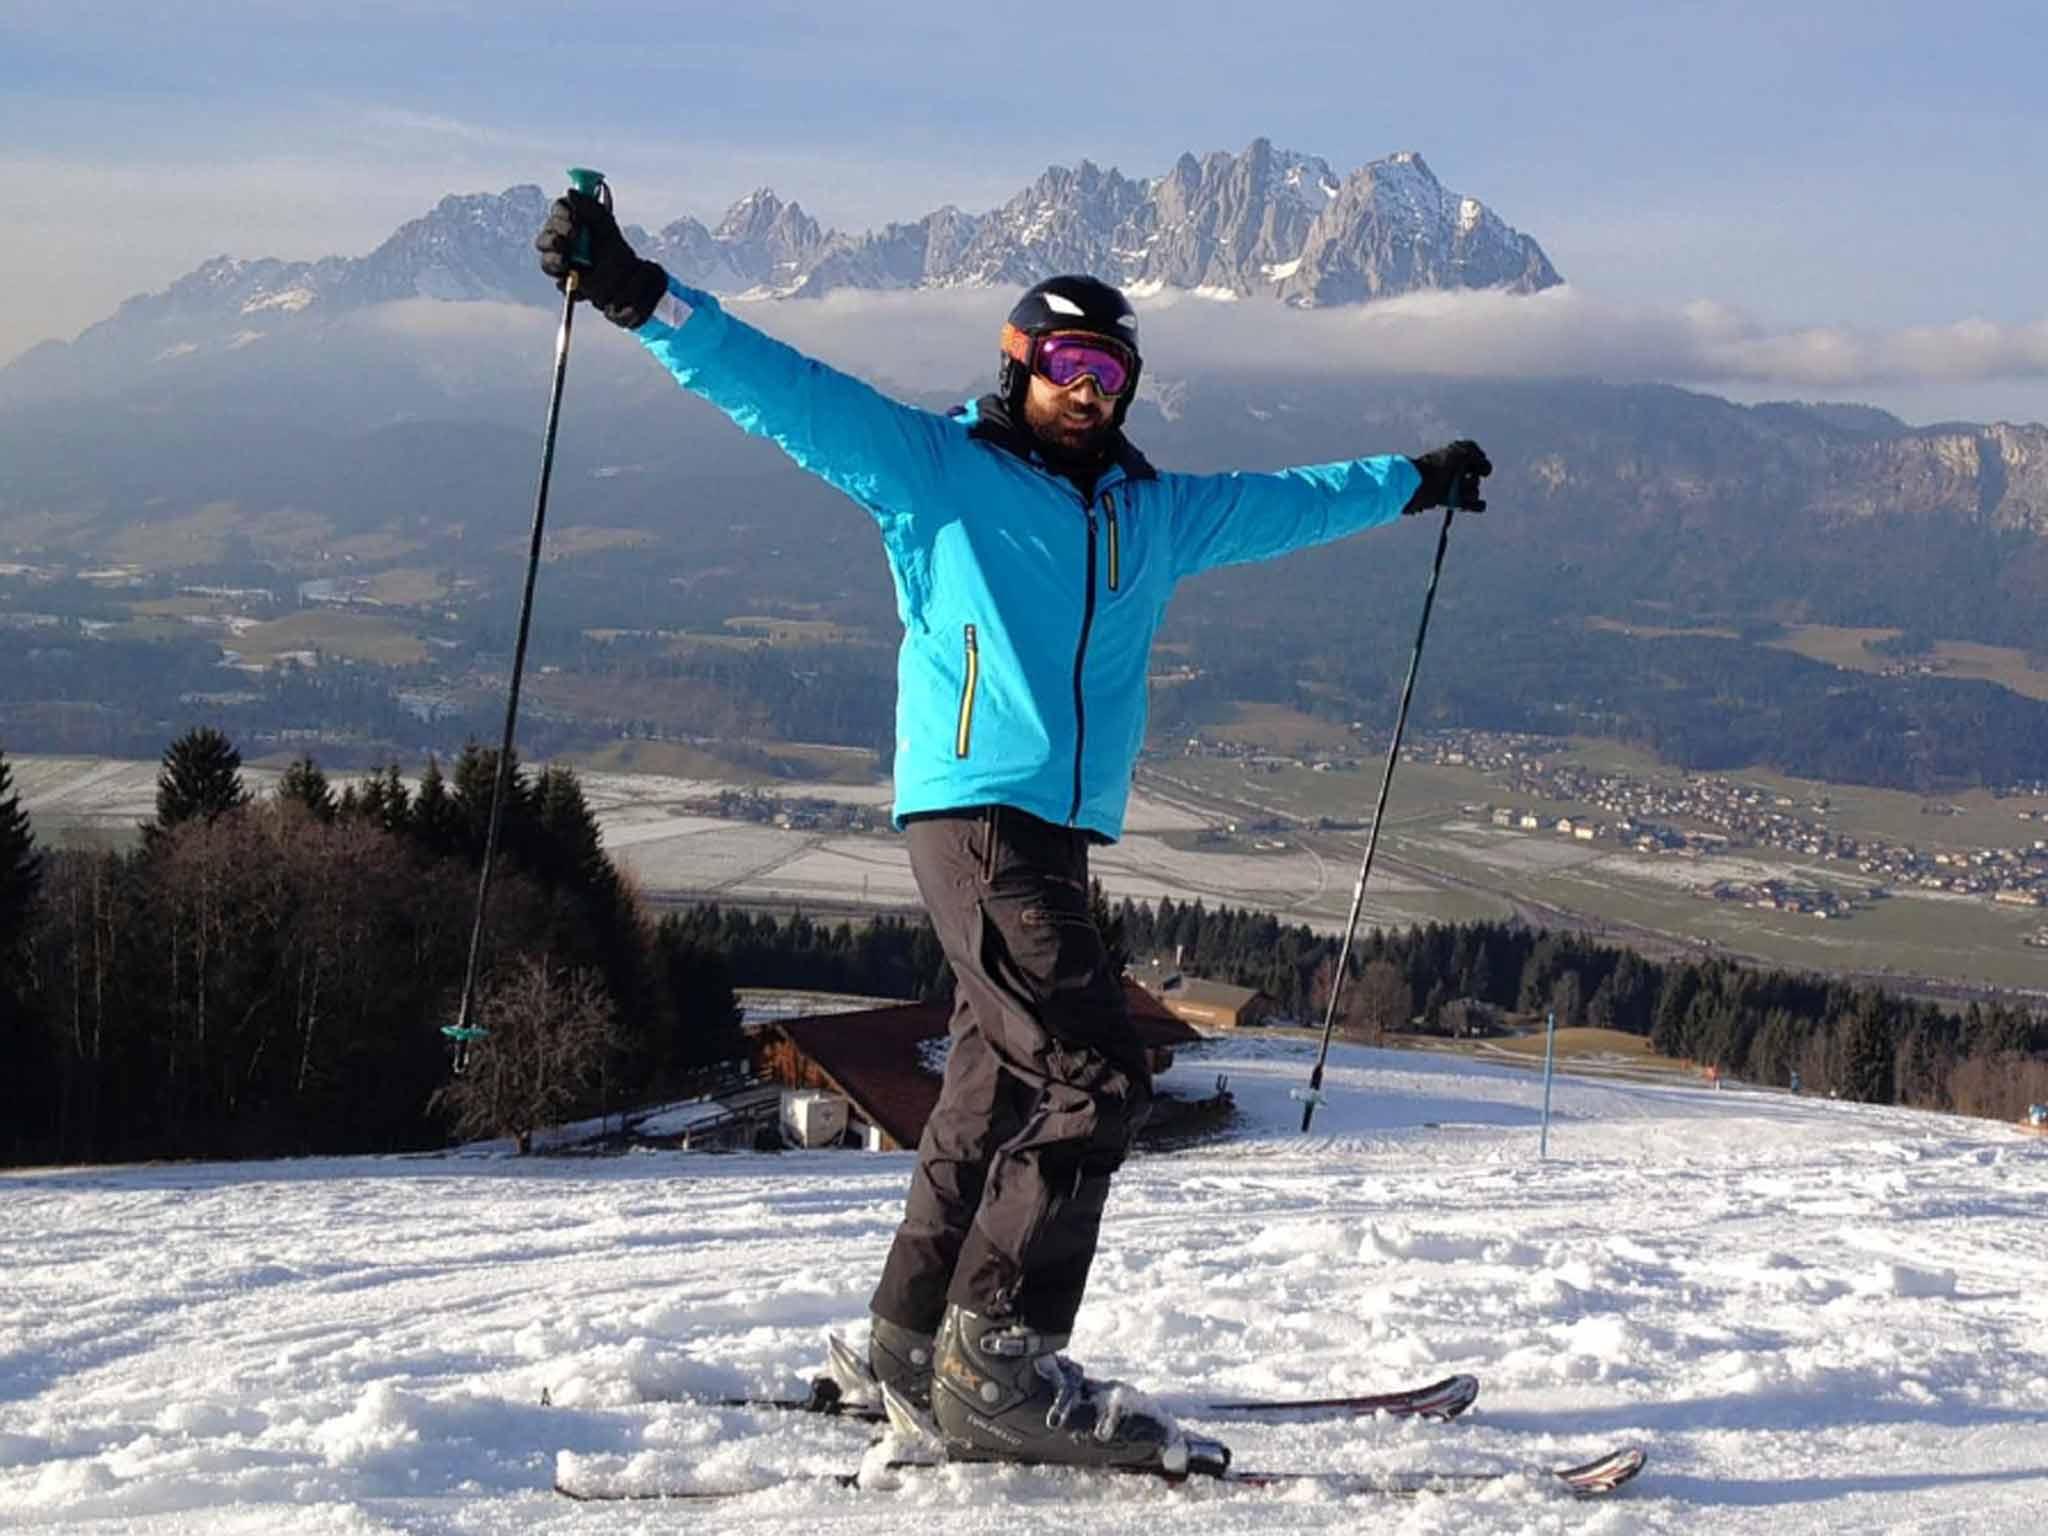 22 Best Flaunt It Swivel Ski Tour images | Ski, Ski ...